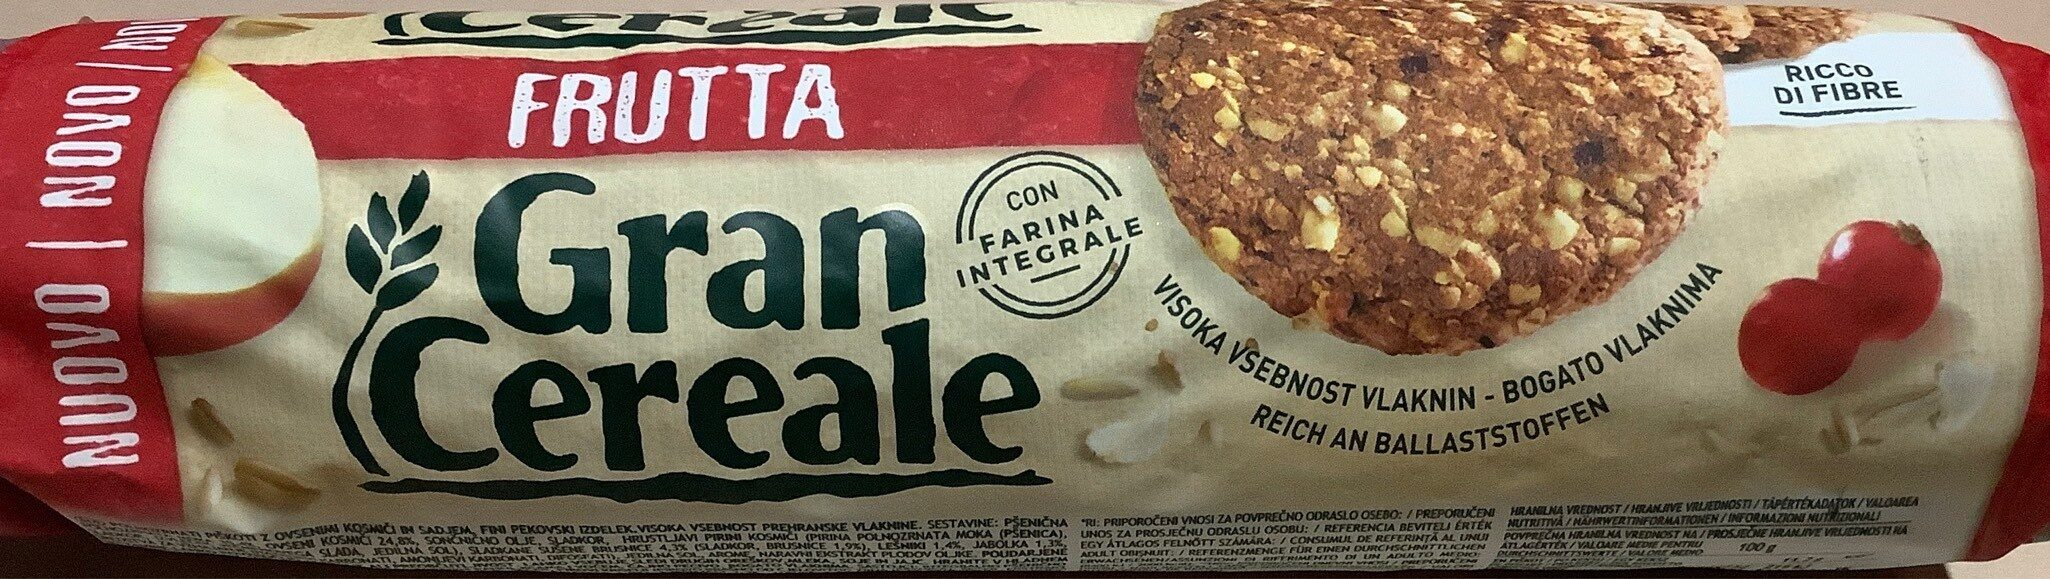 Gran Cereale Frutta - Product - fr